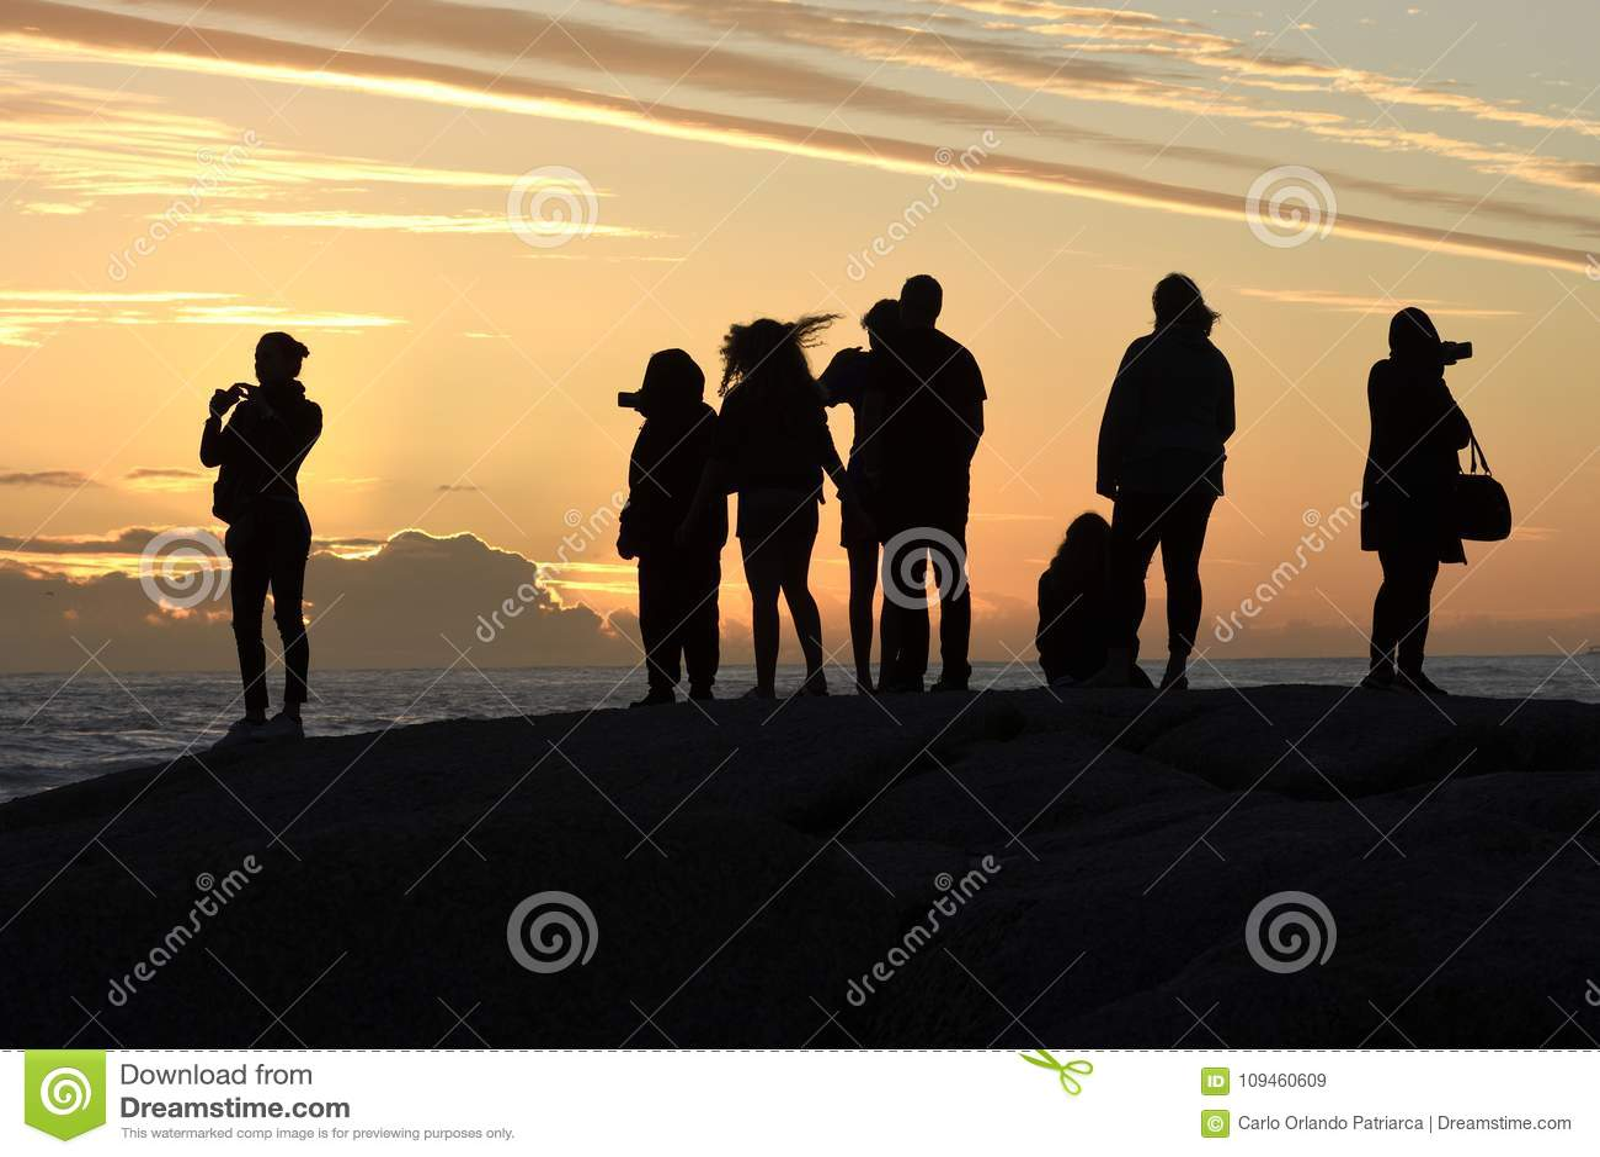 Groep die silhouetten op de zonsondergang in Kampenbaai letten, Cape Town, Zuid-Afrika